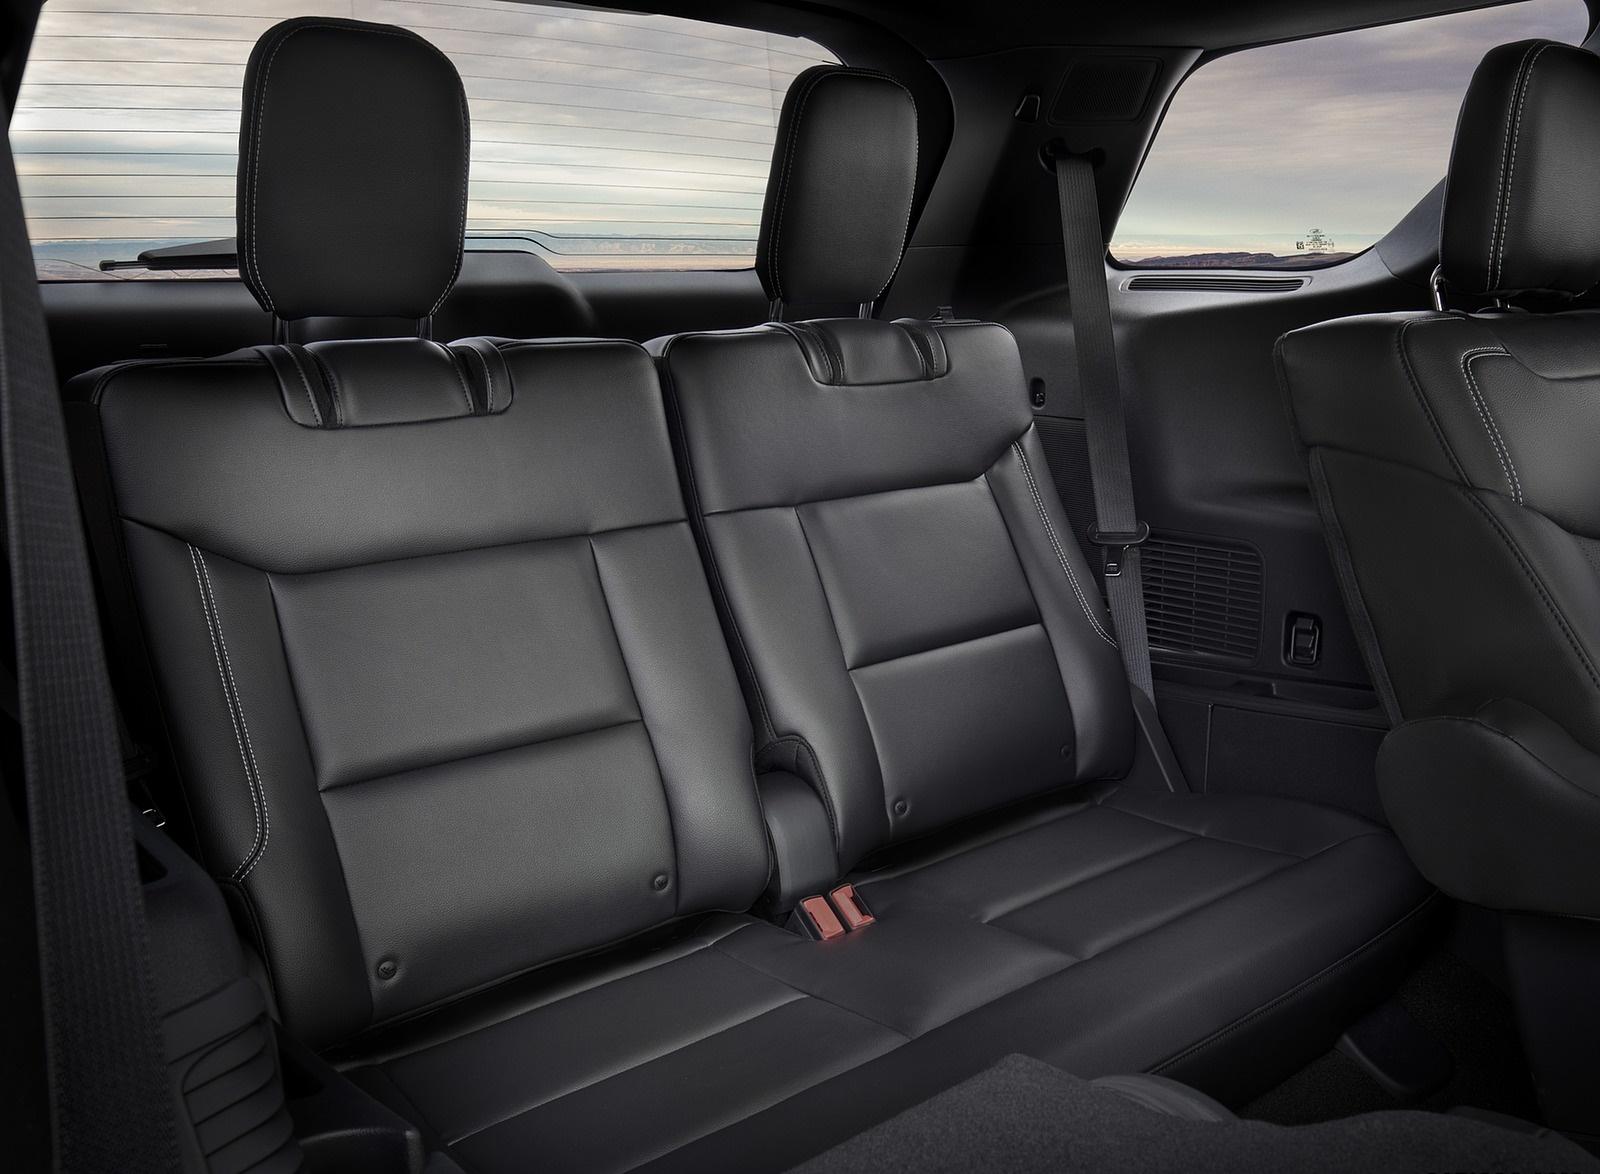 2020 Ford Explorer Interior Third Row Seats Wallpaper (15)